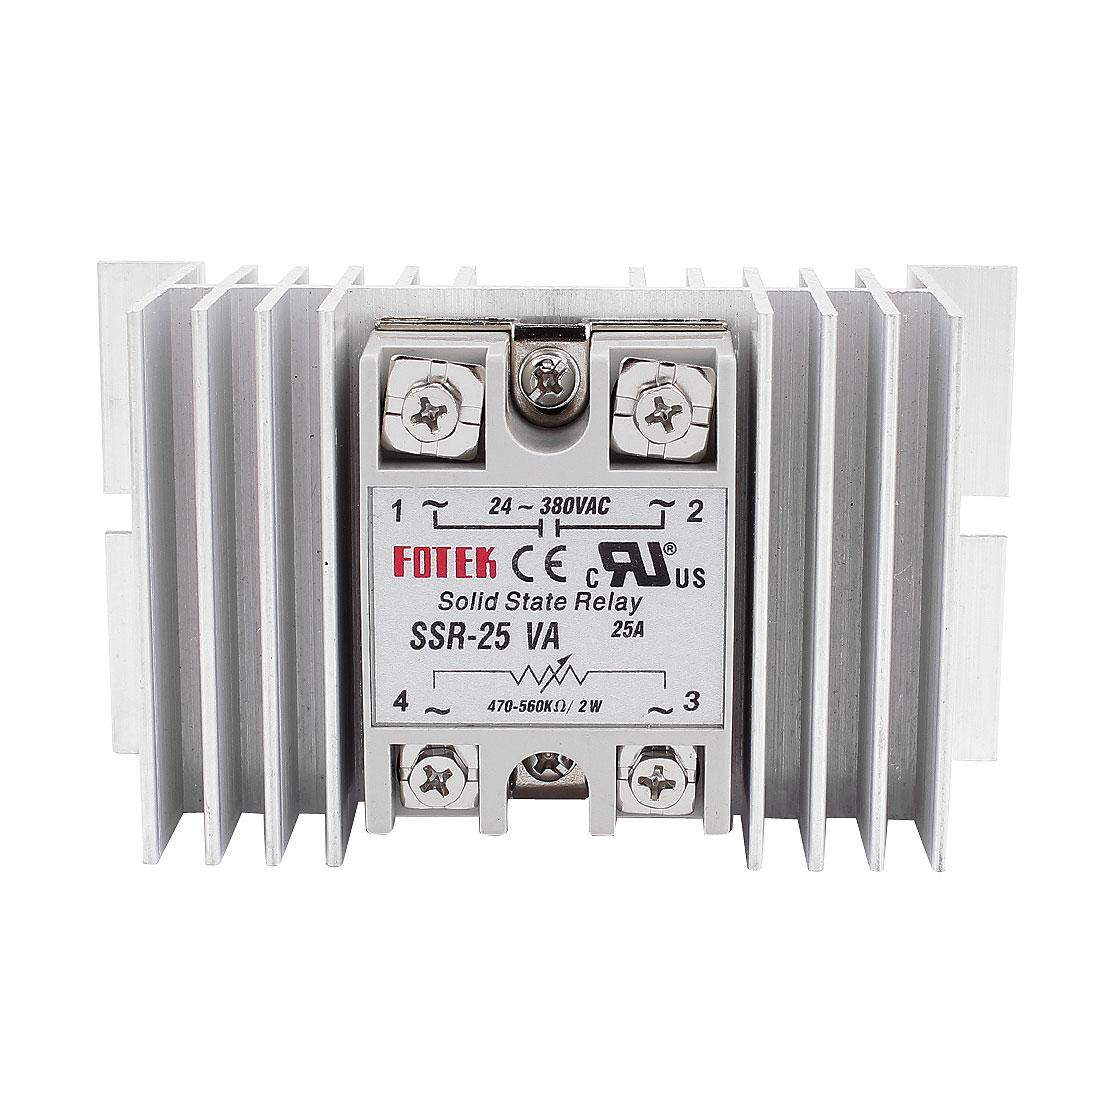 SSR-25VA 25A Input 470-560kohm Output 24-380V AC Soild State Relay Proportional Controllers + Heat Sink